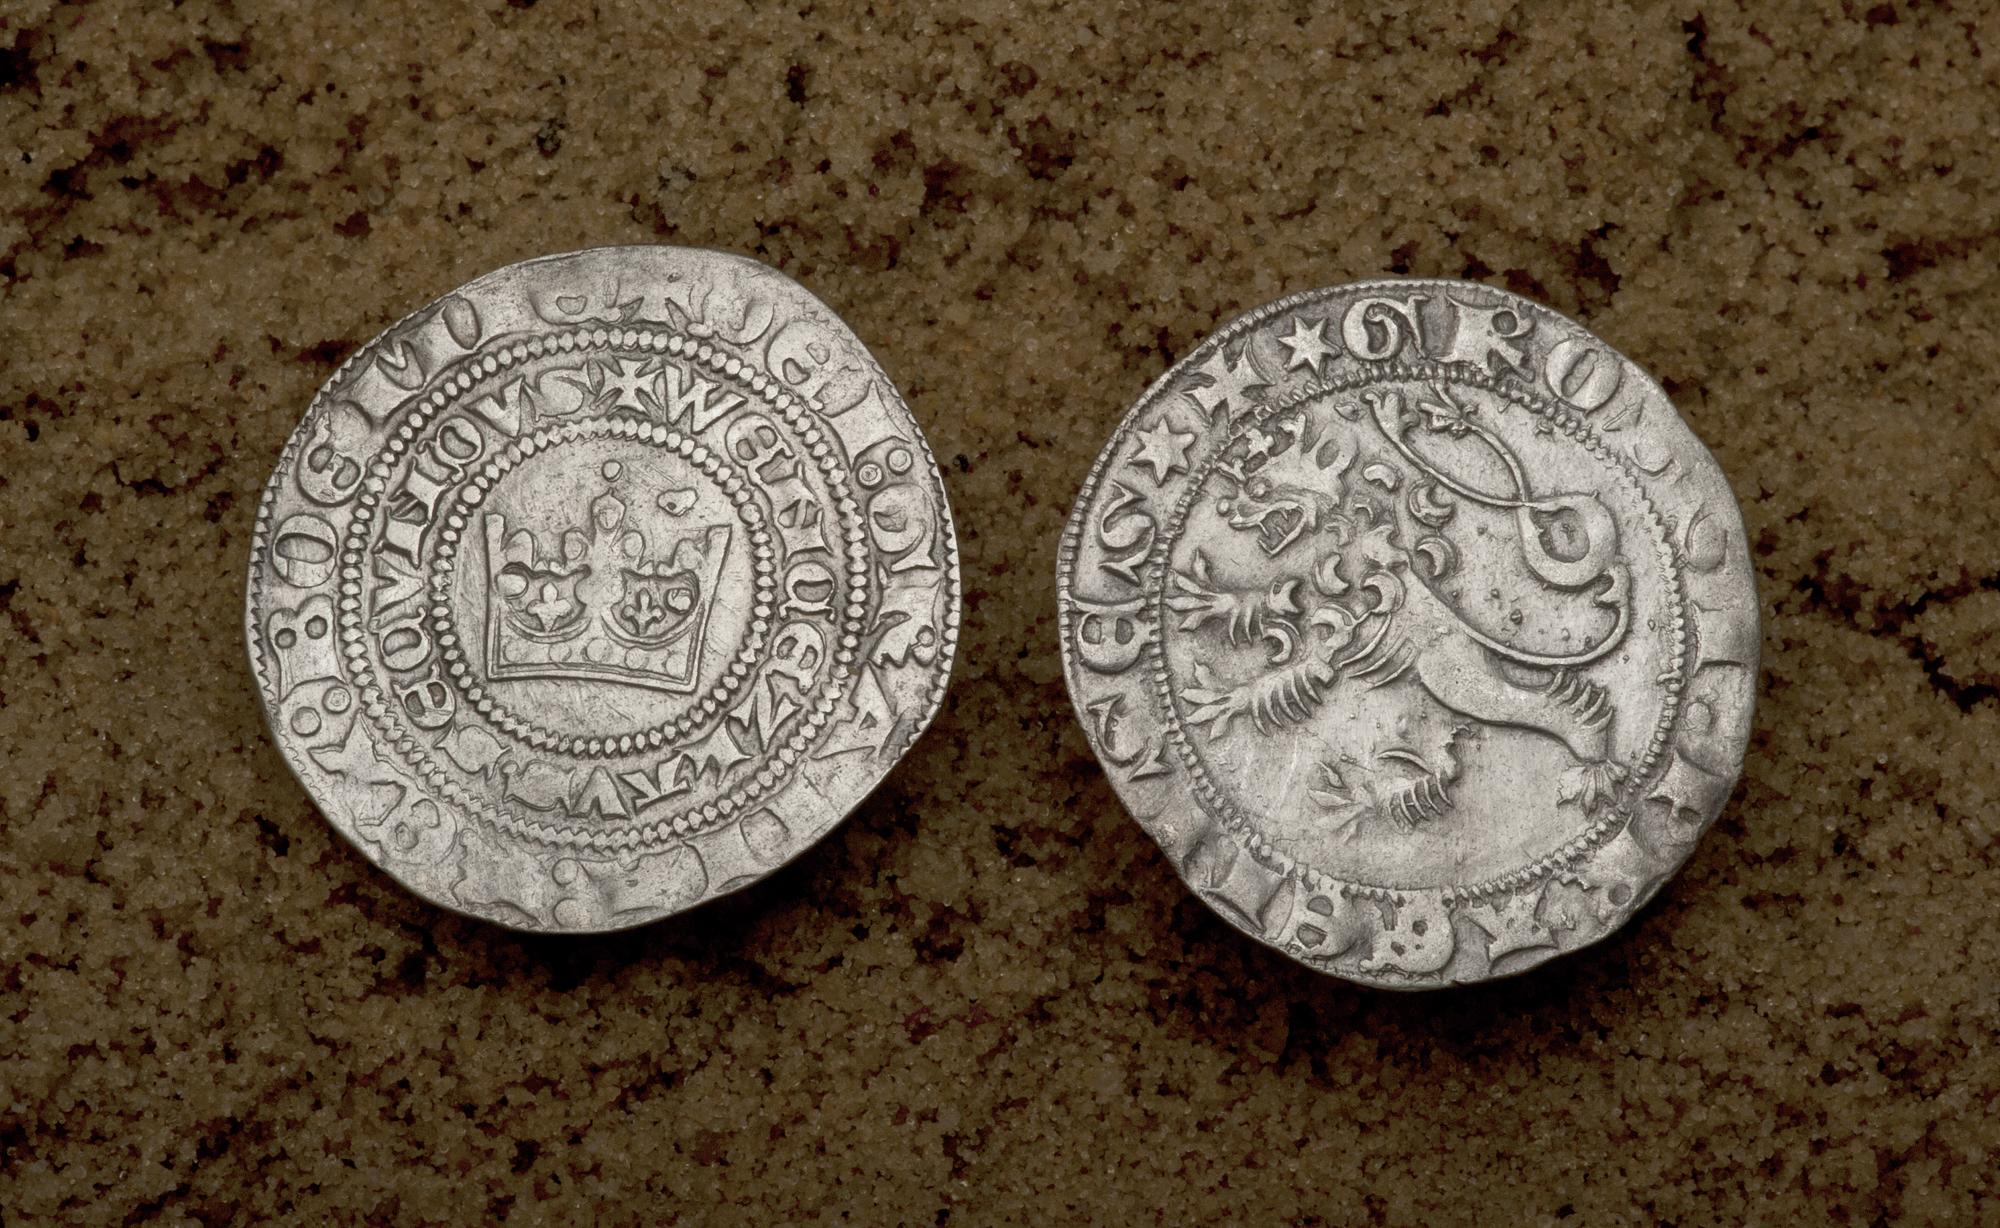 Skarb srebrnych monet